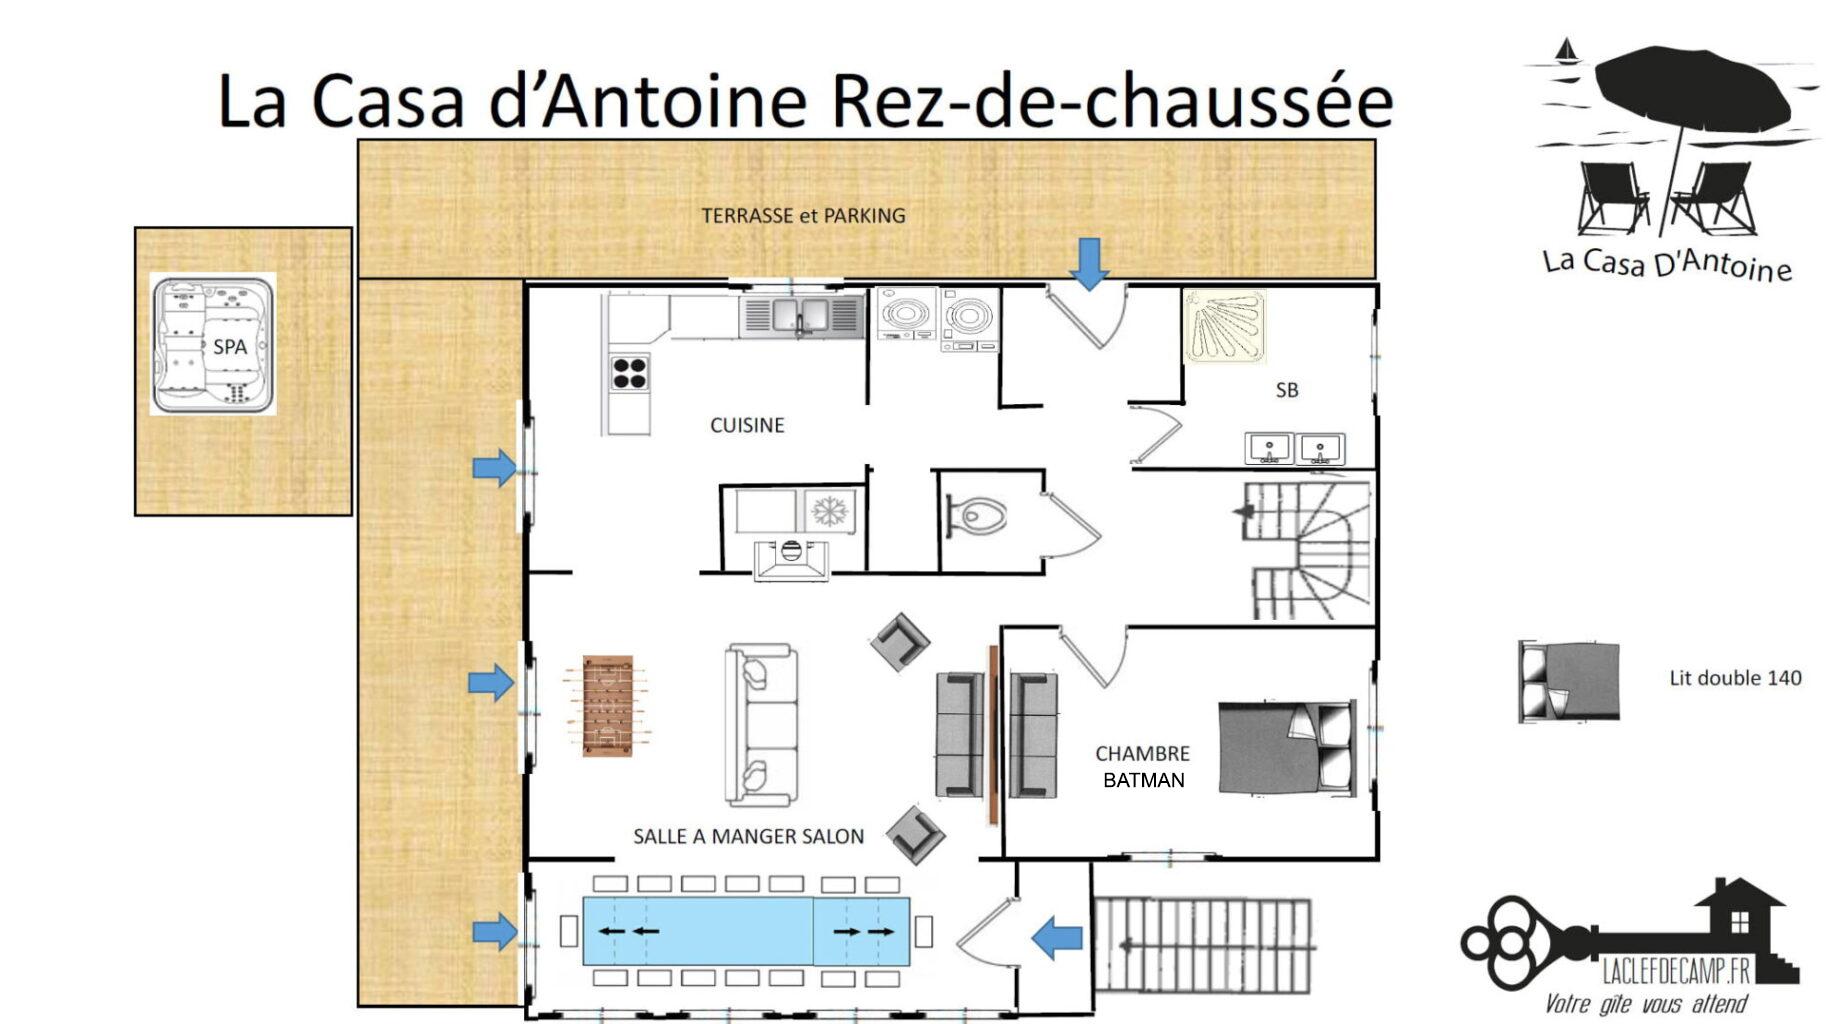 La-casa-dantoine-RDC-scaled